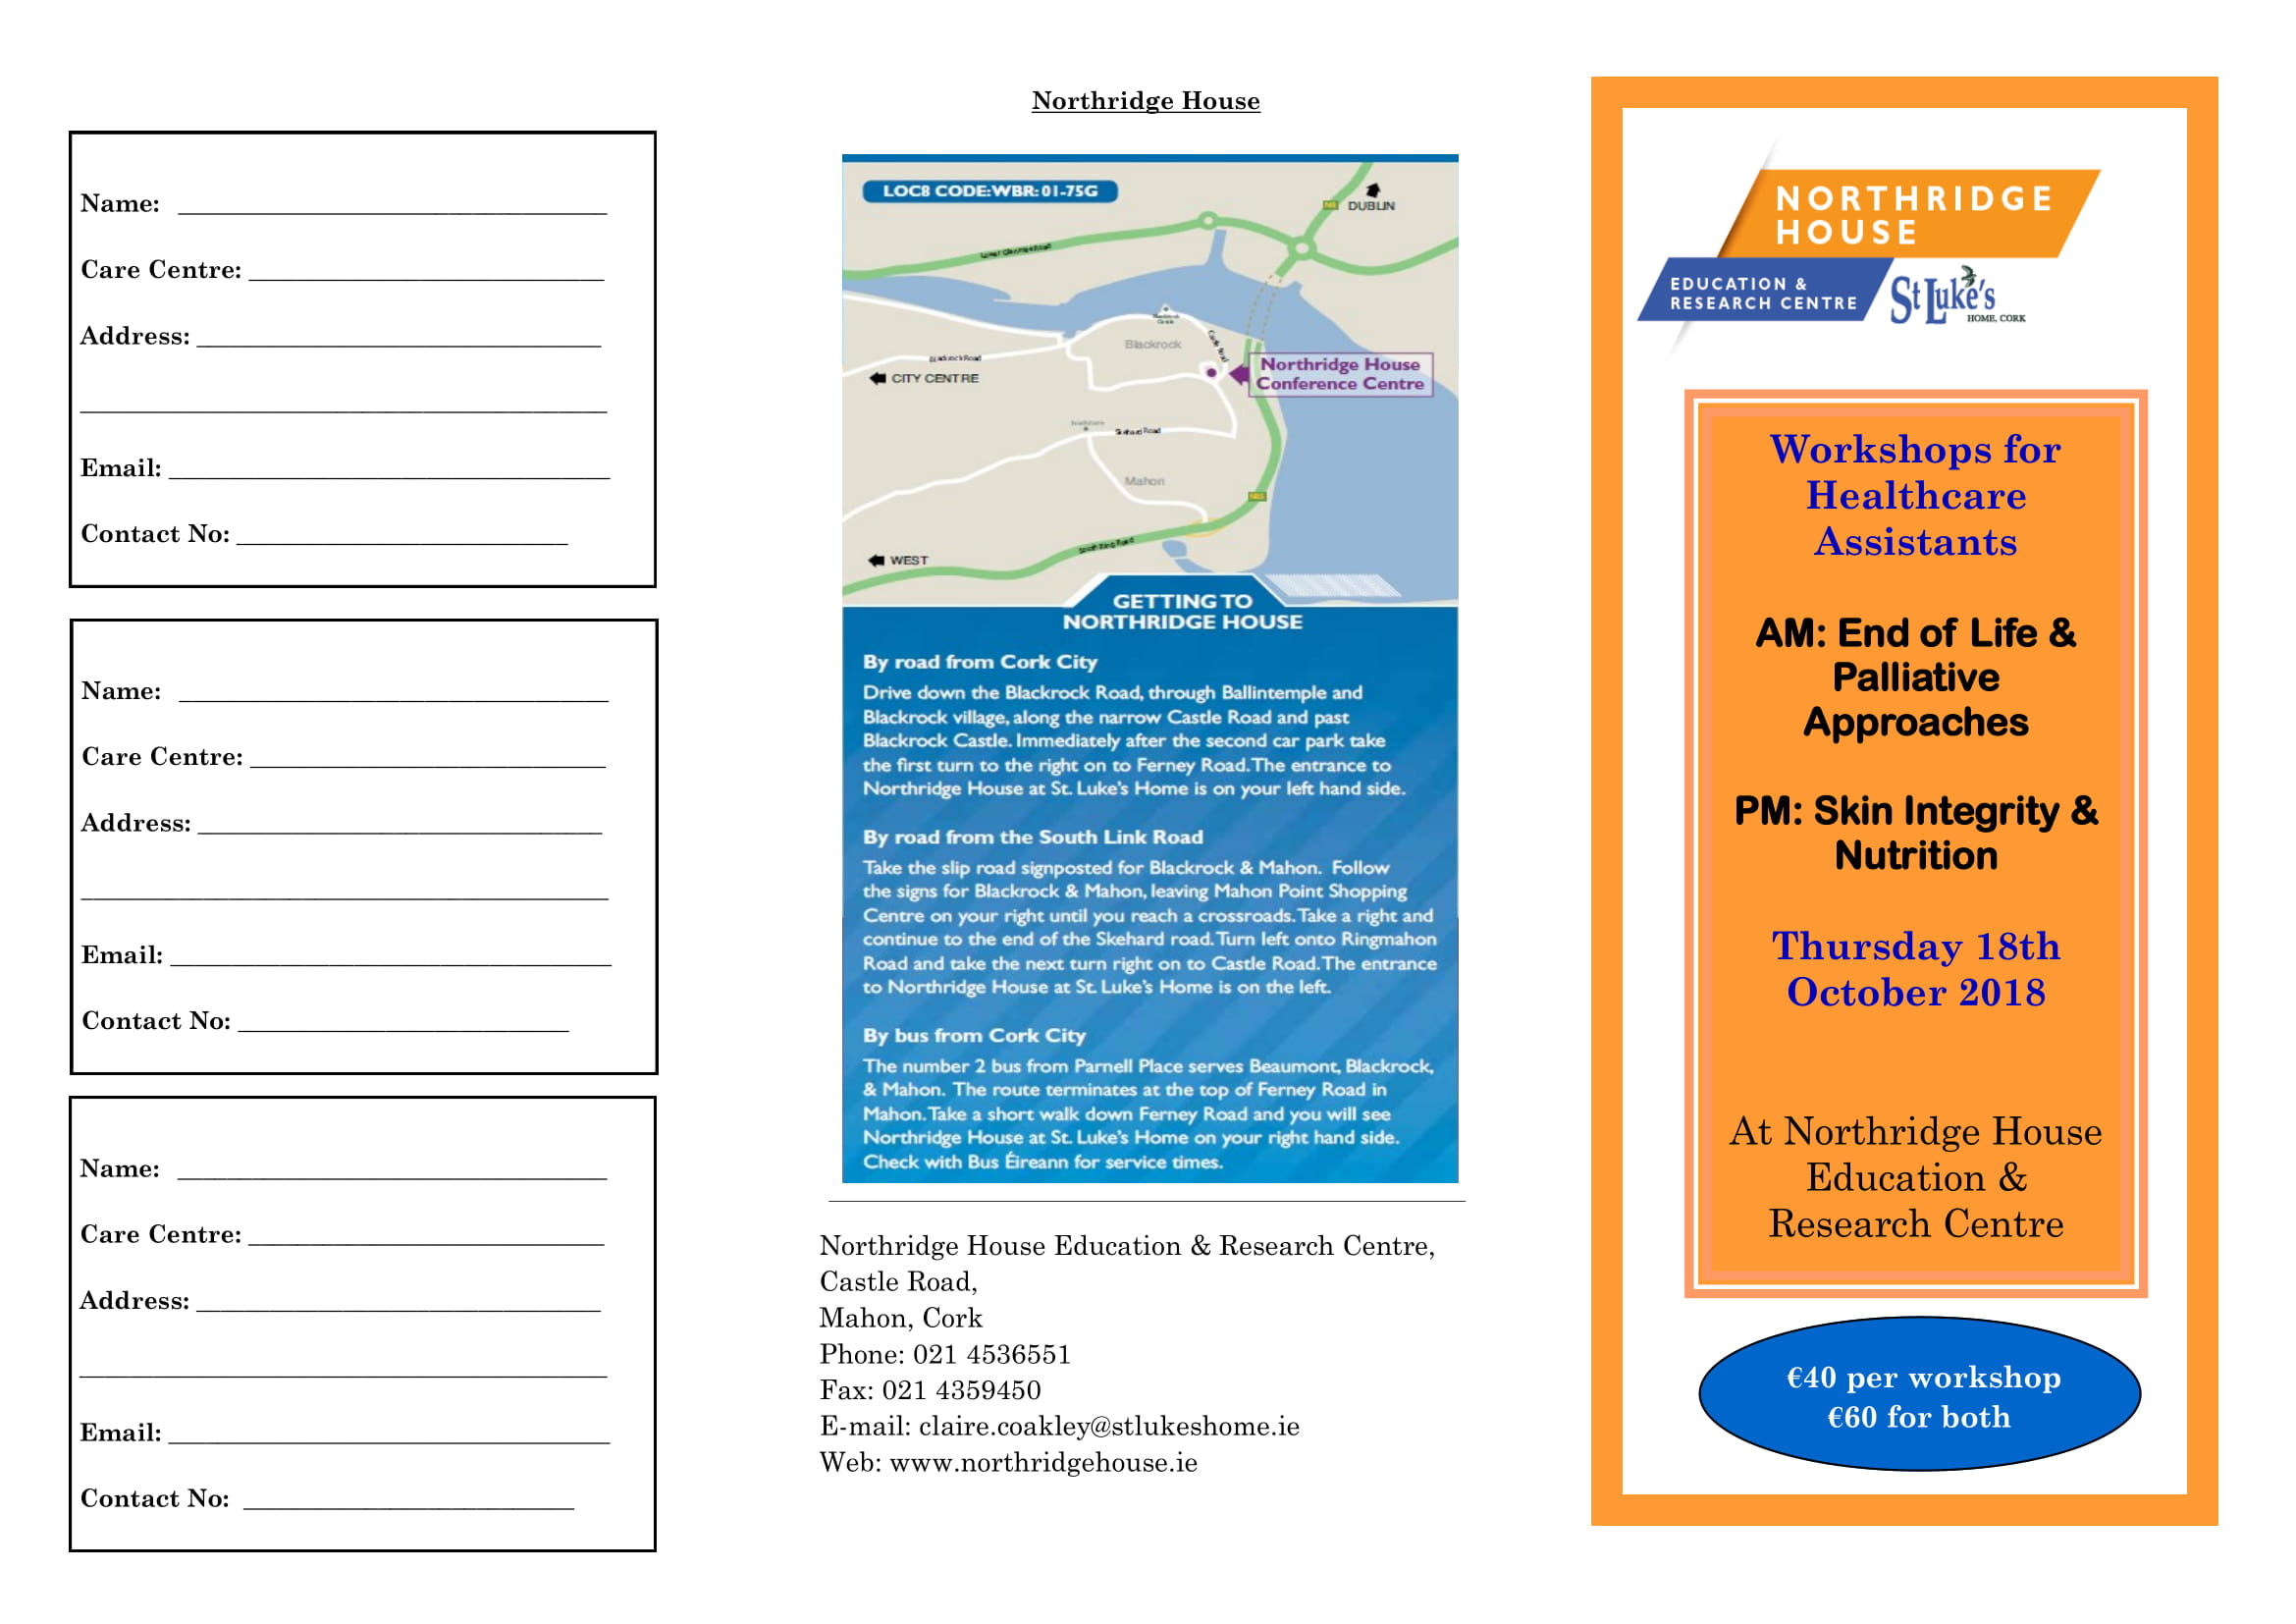 HCA-Conference-Brochure-Oct-18-1